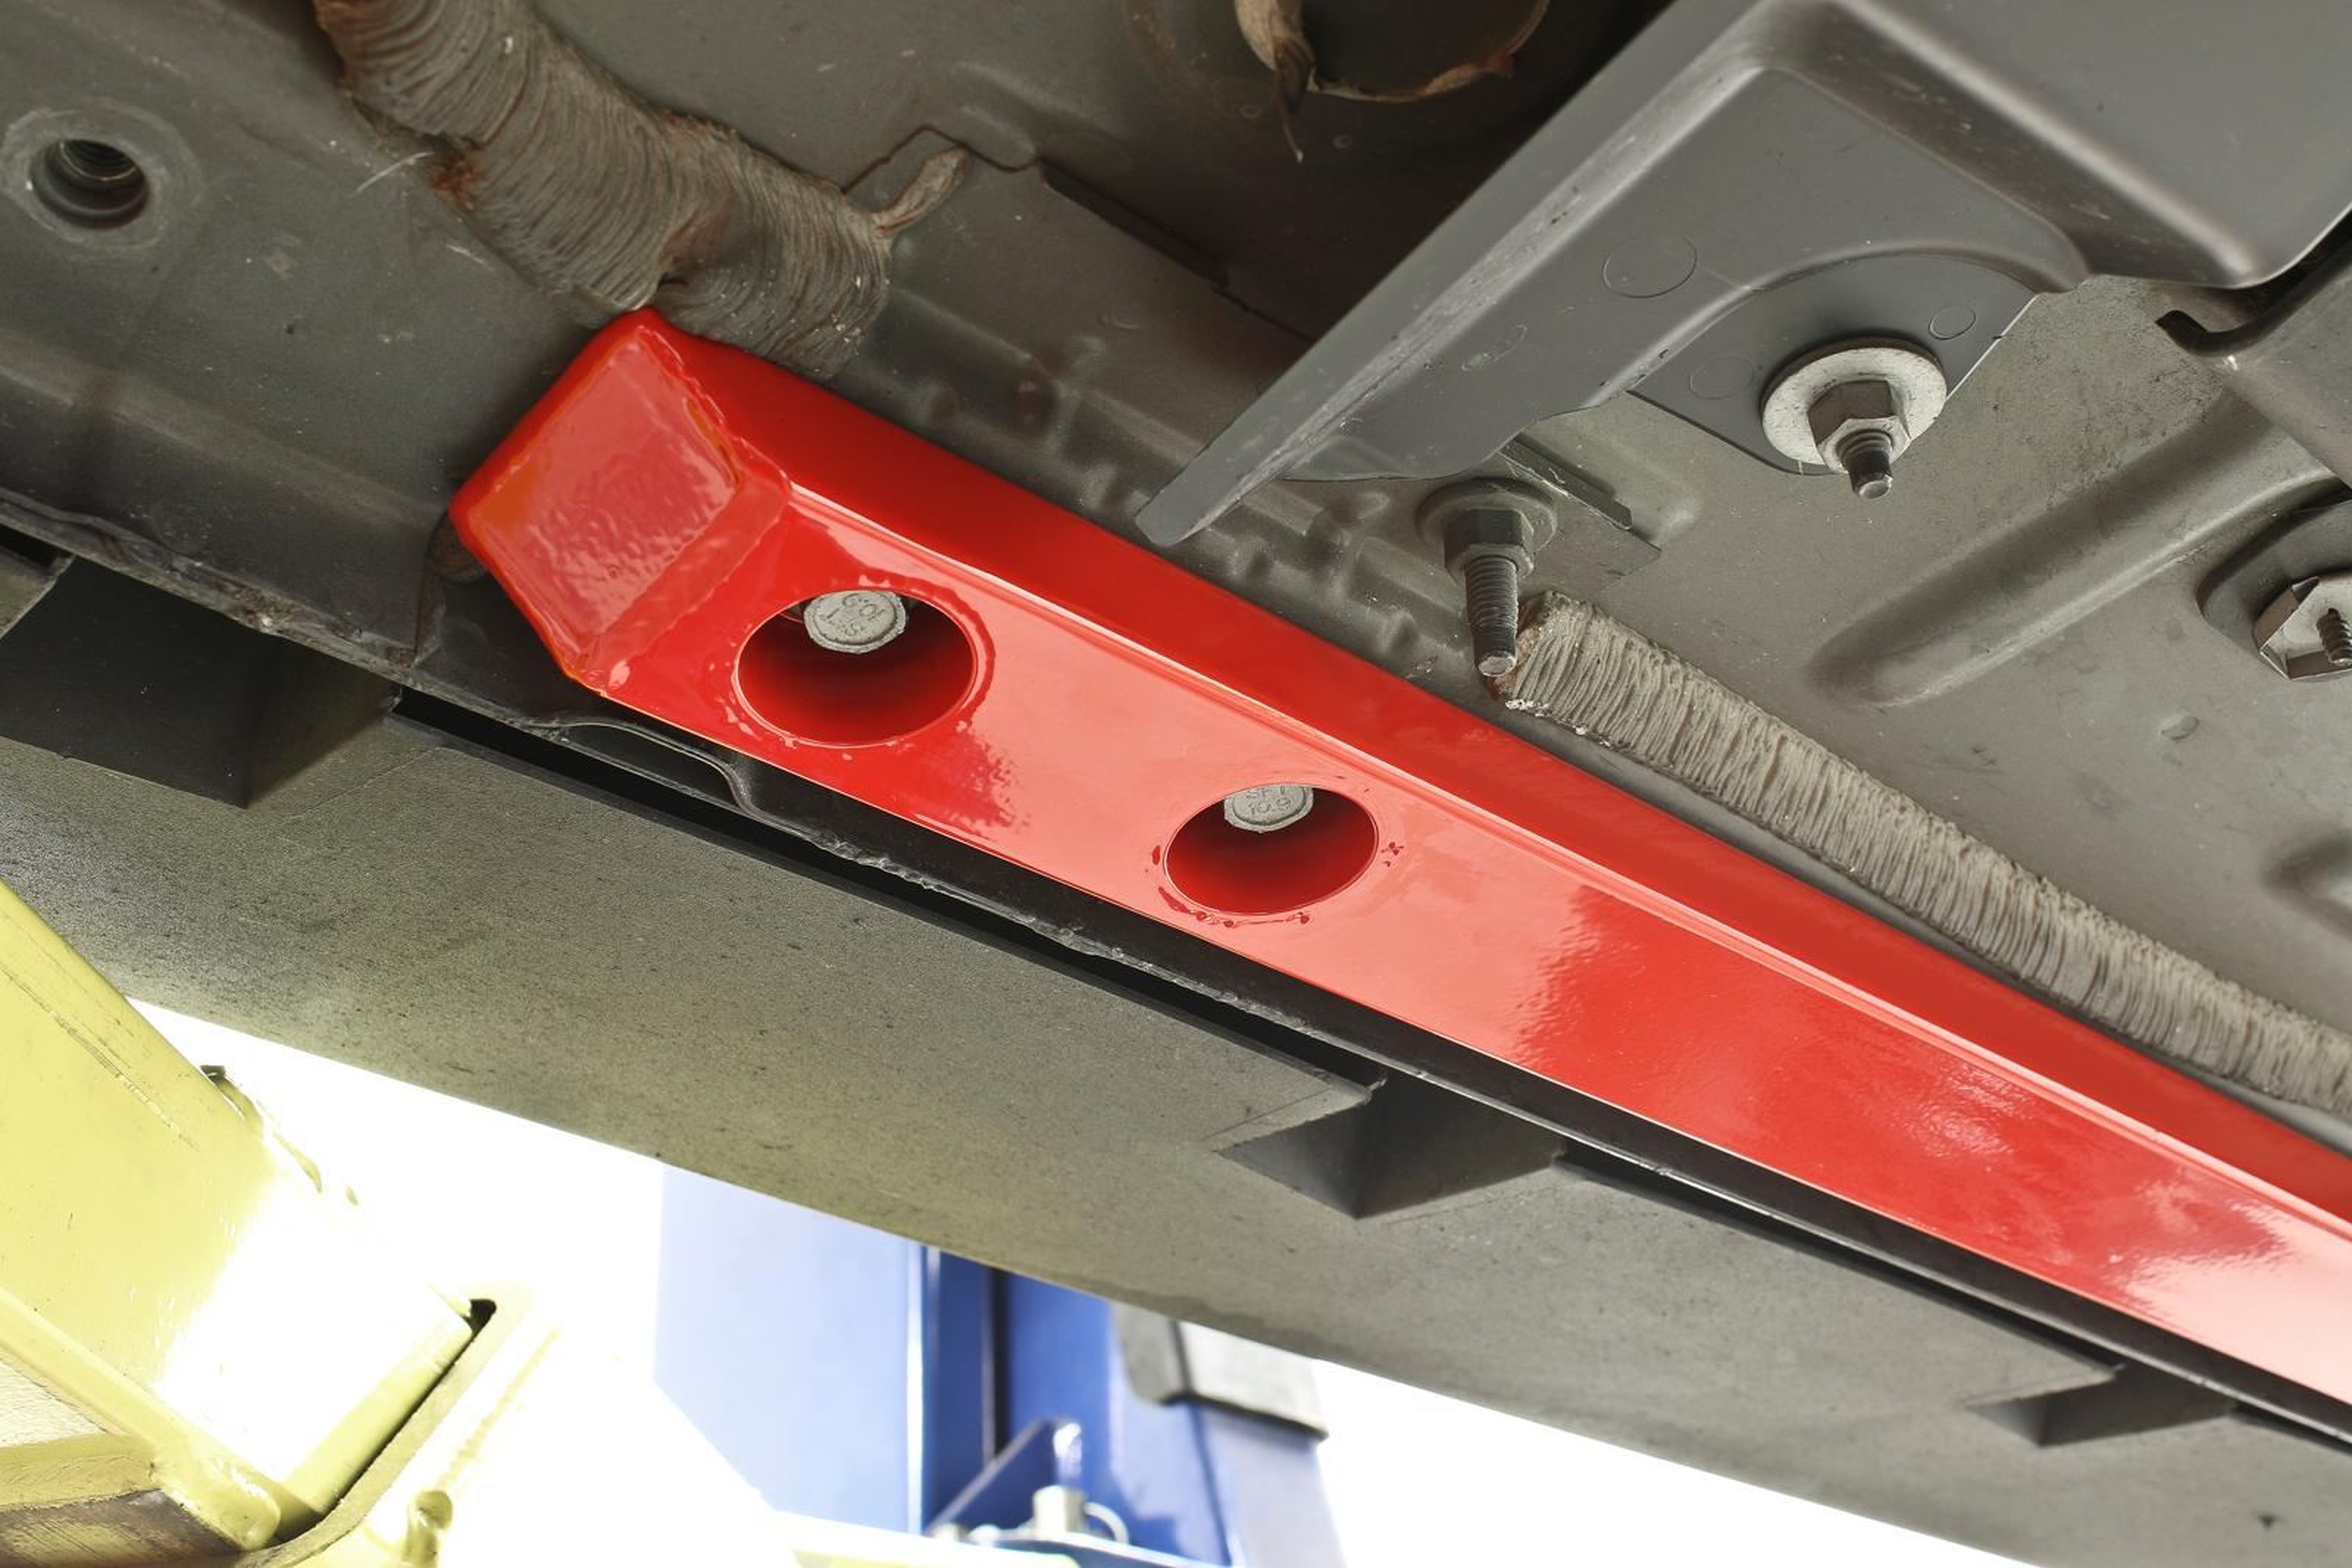 BMR Suspension CJR002 - Chassis Jacking Rail, Super Low ...